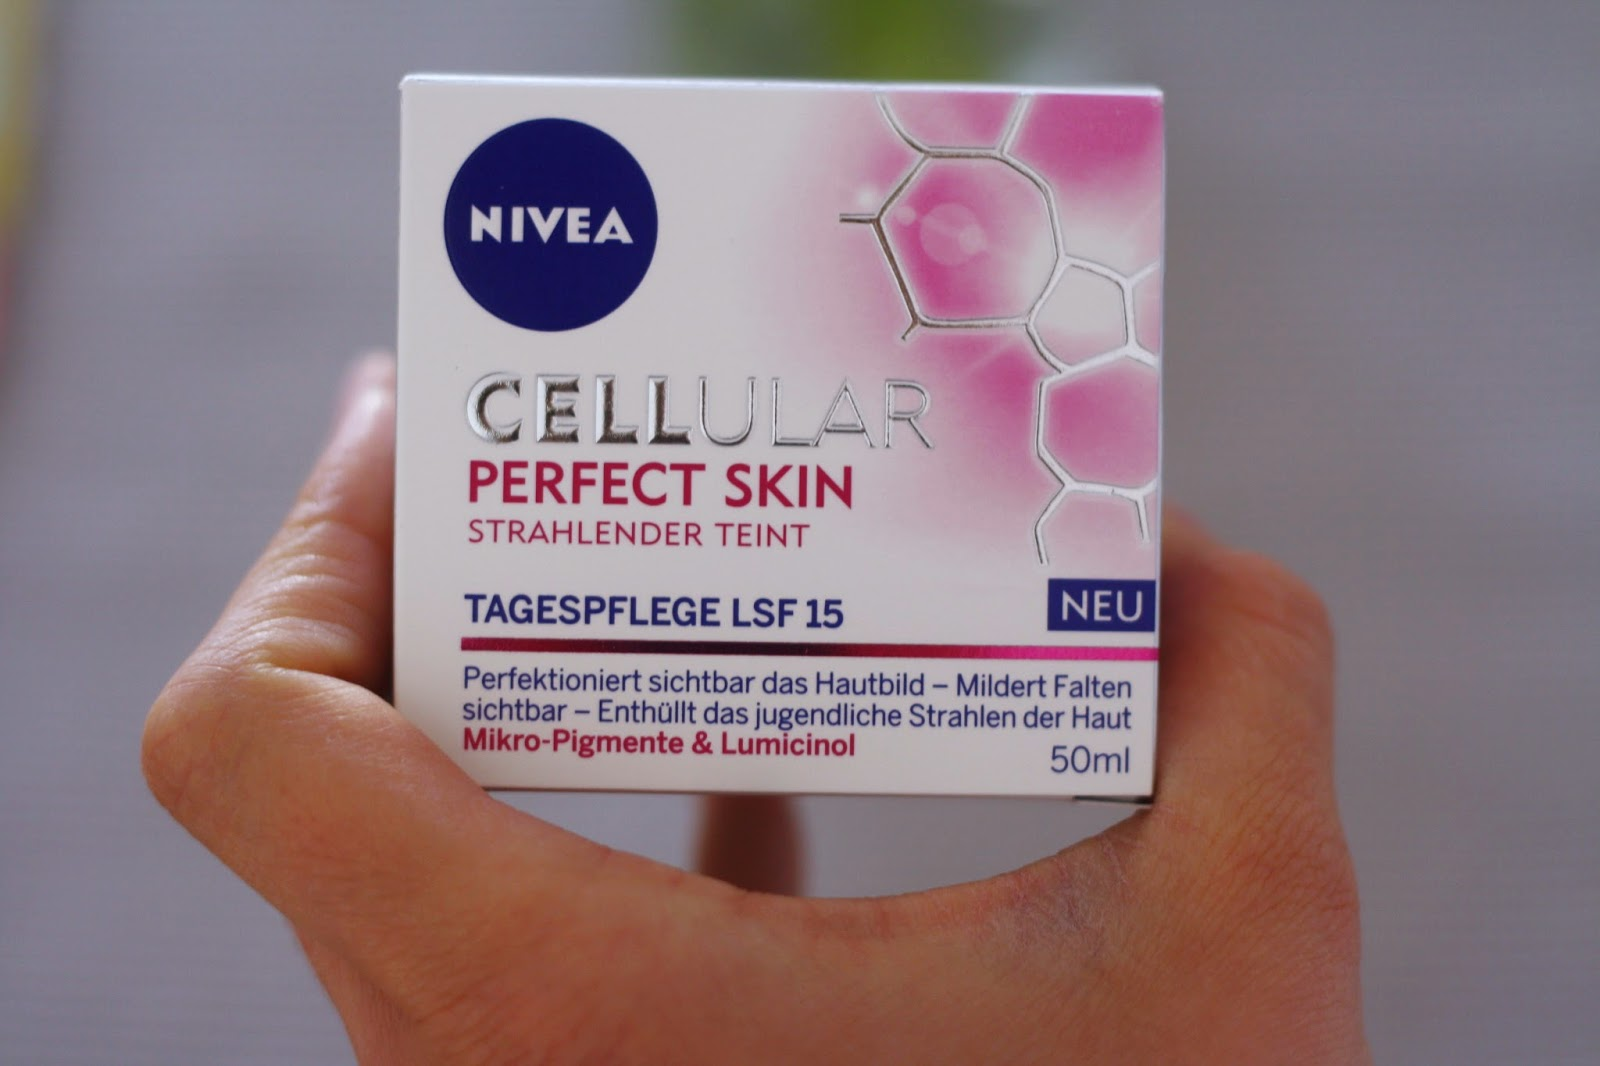 Nivea Cellular Perfect Skin